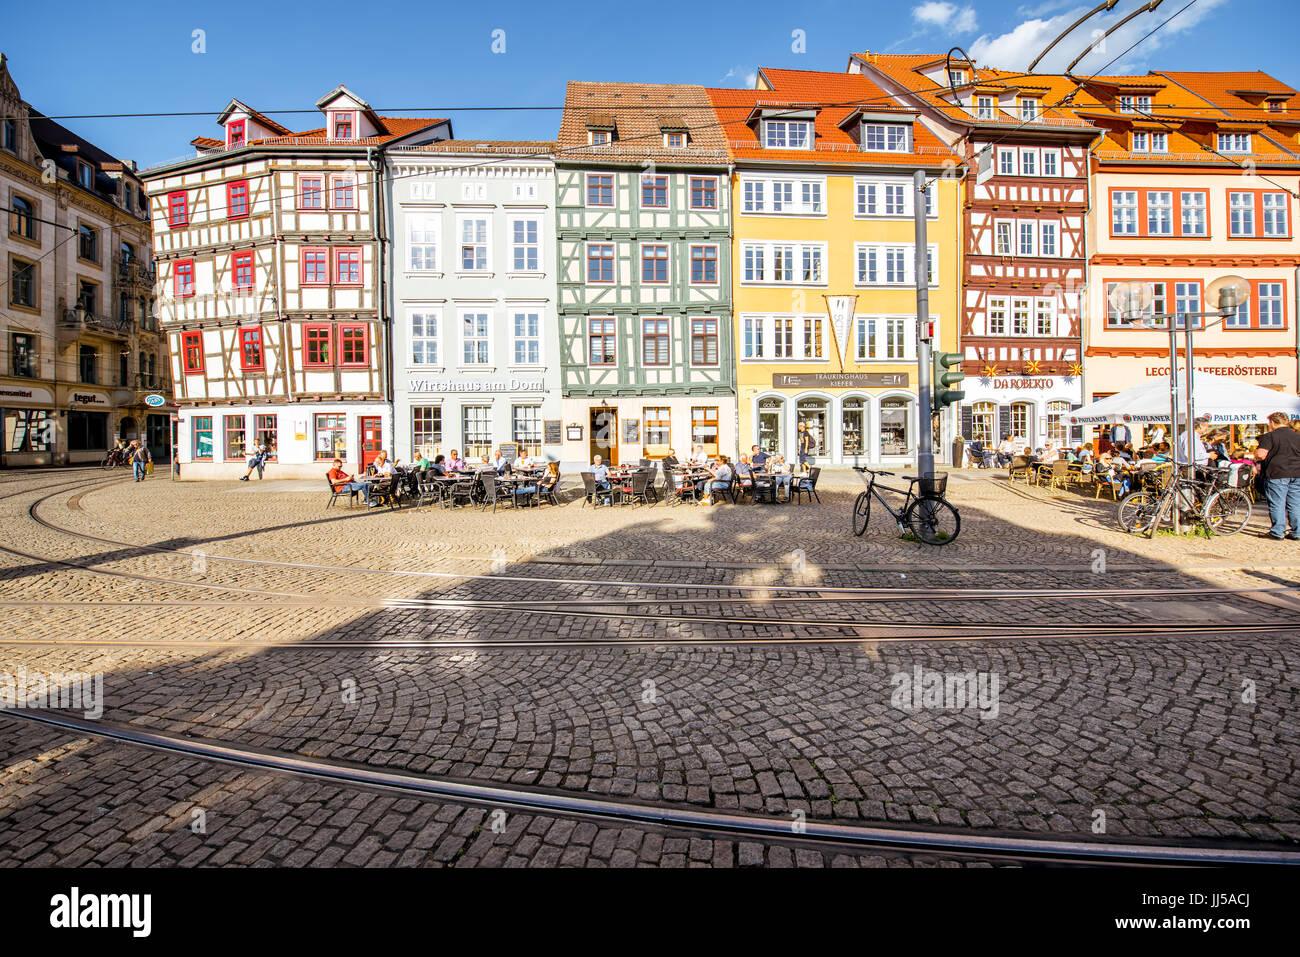 Erfurt city in Germany - Stock Image